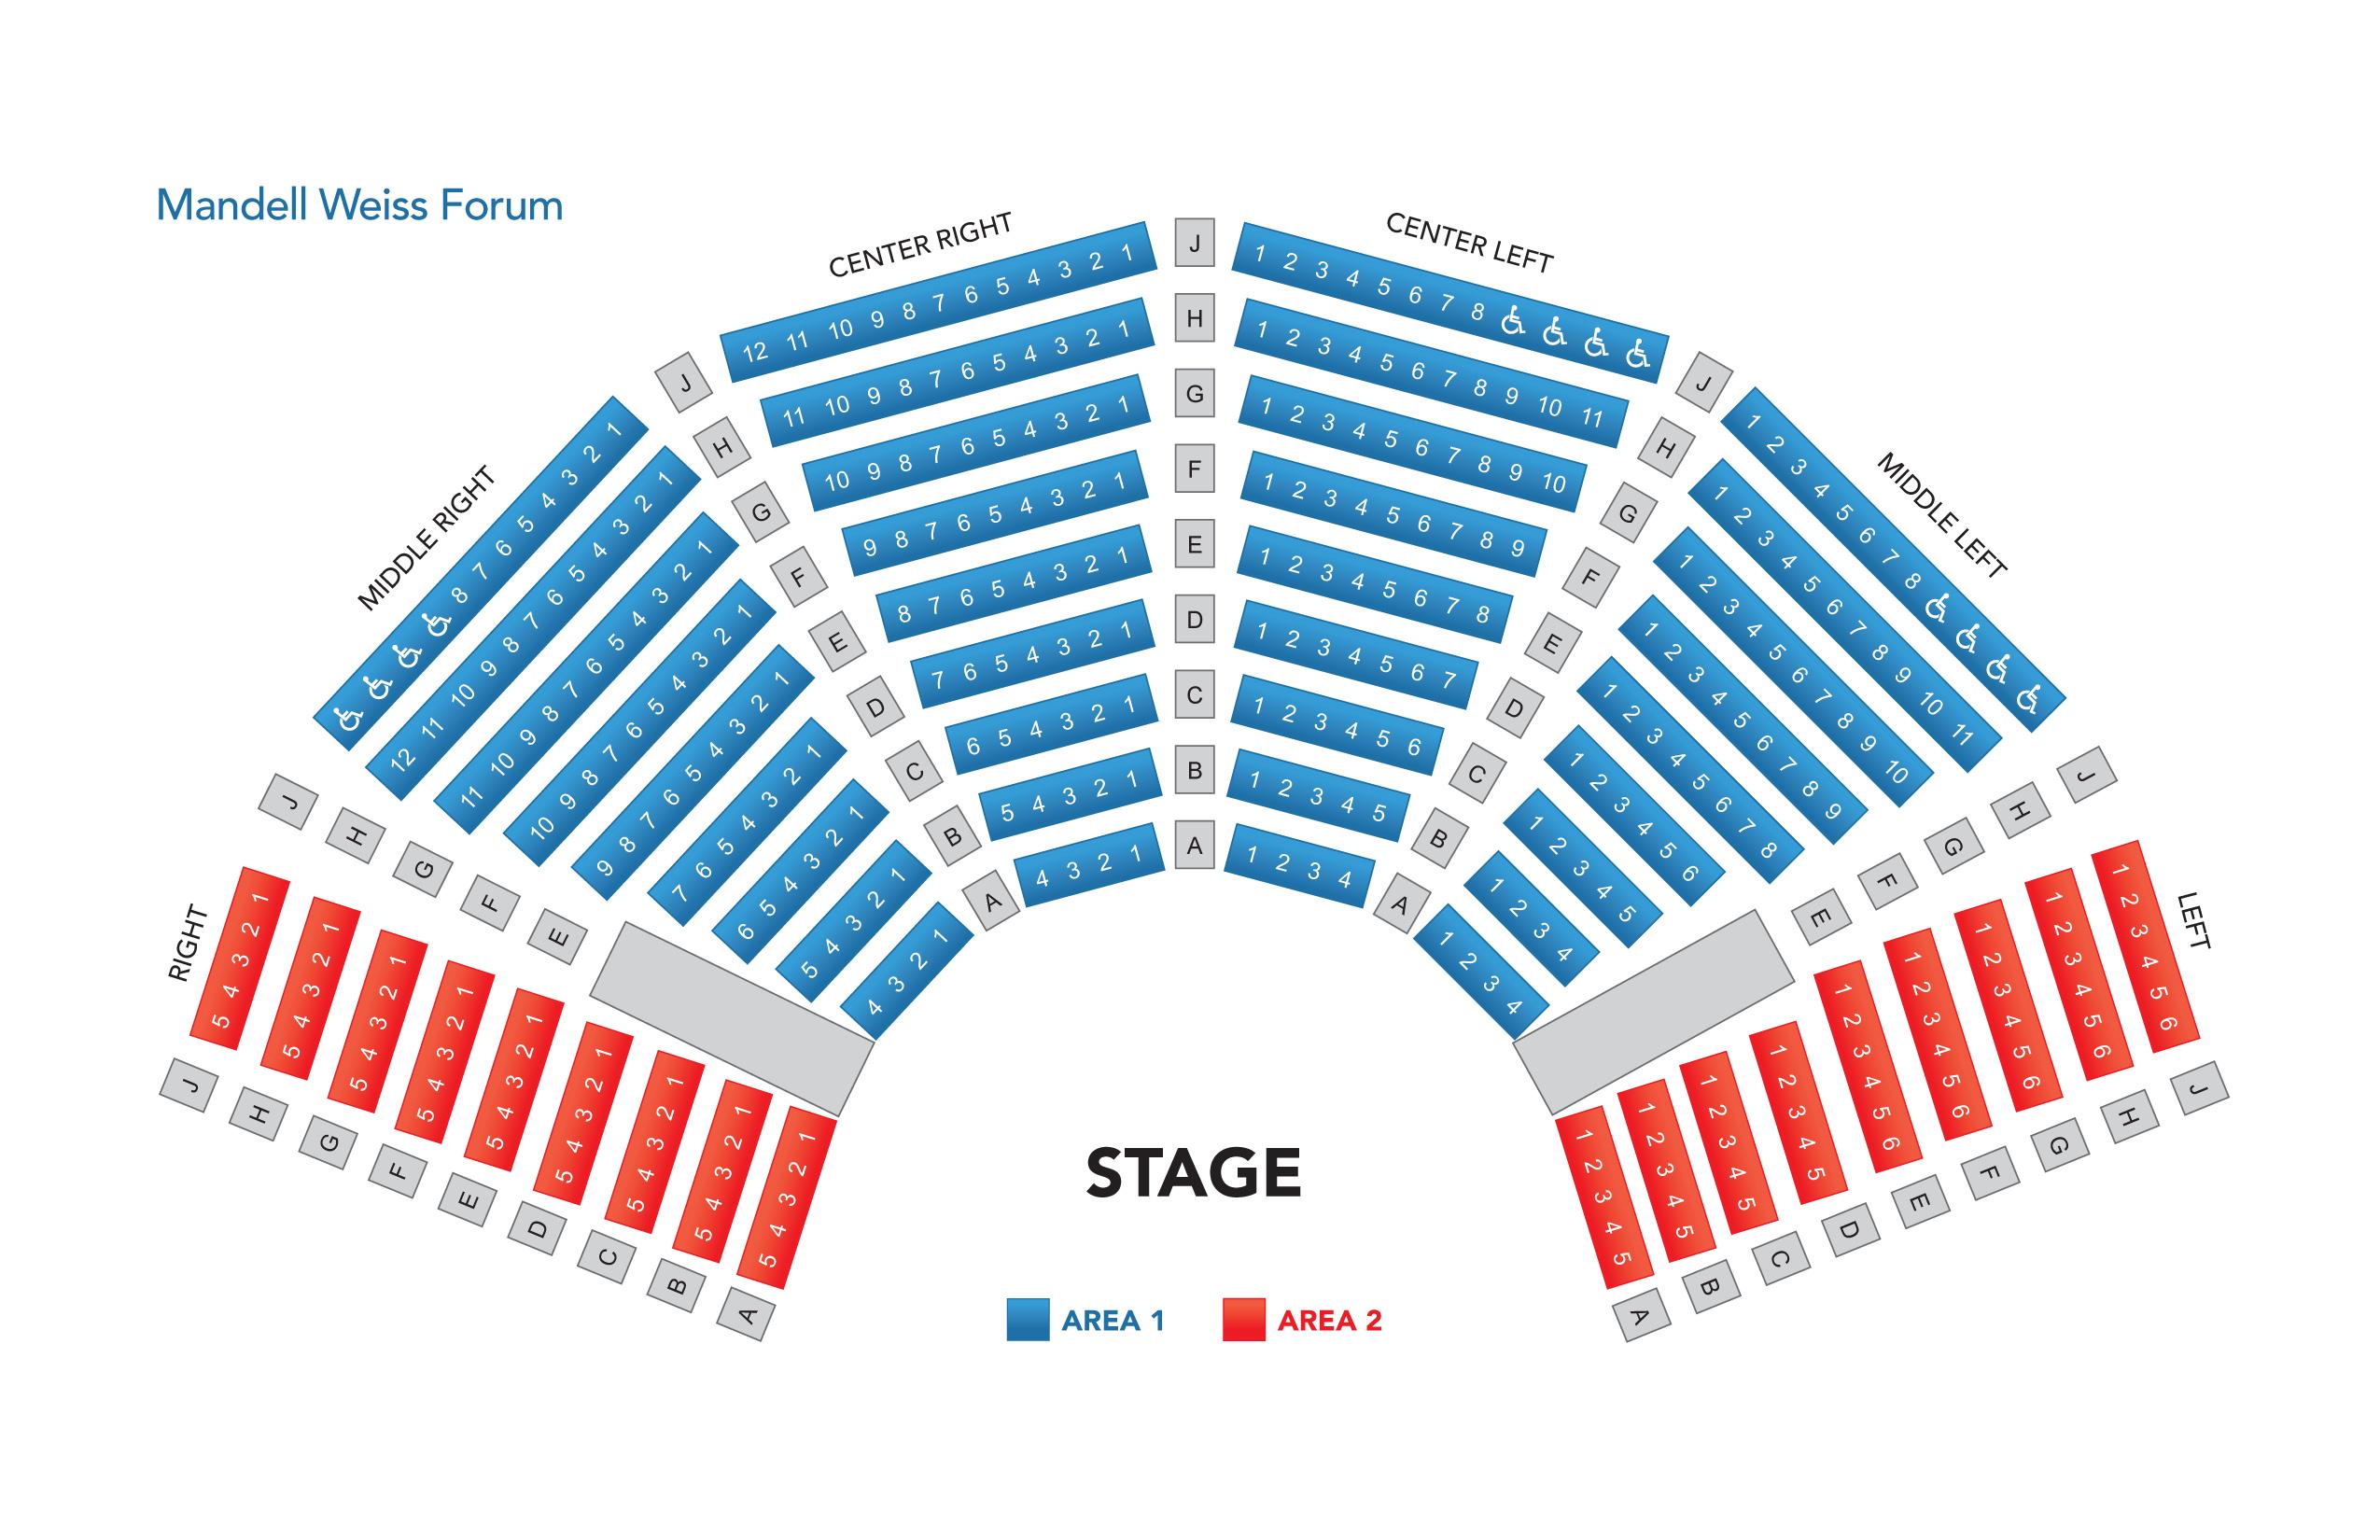 La Jolla Playhouse Theatre Specifications La Jolla Playhouse